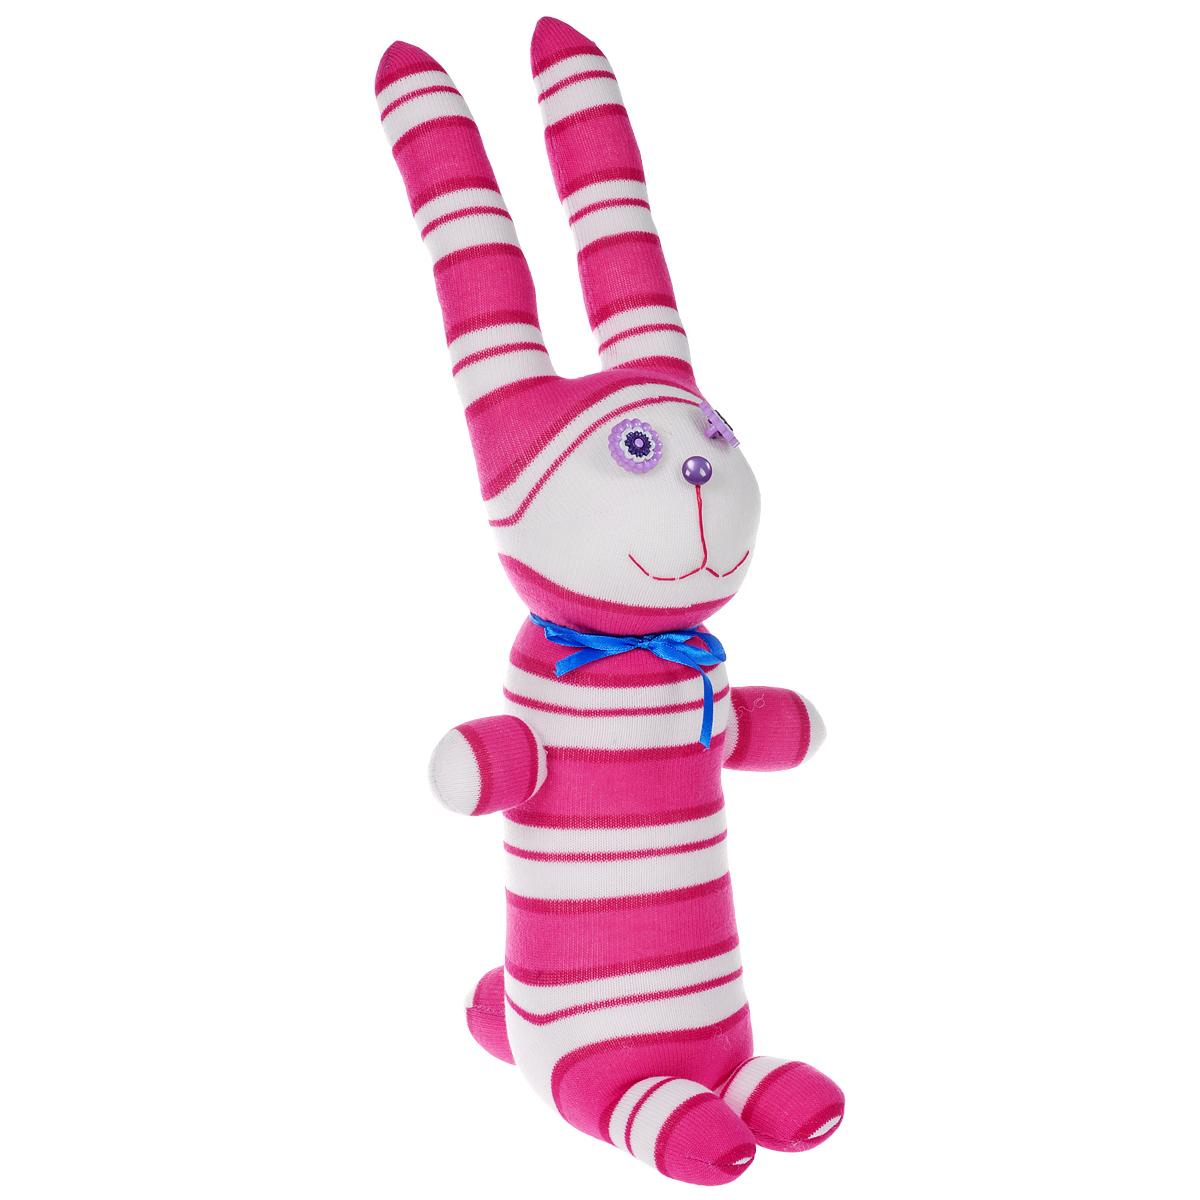 Игрушка Носкитос. Заяц Ромашка - Ручная авторская работа. НОС180614-56НОС180614-56